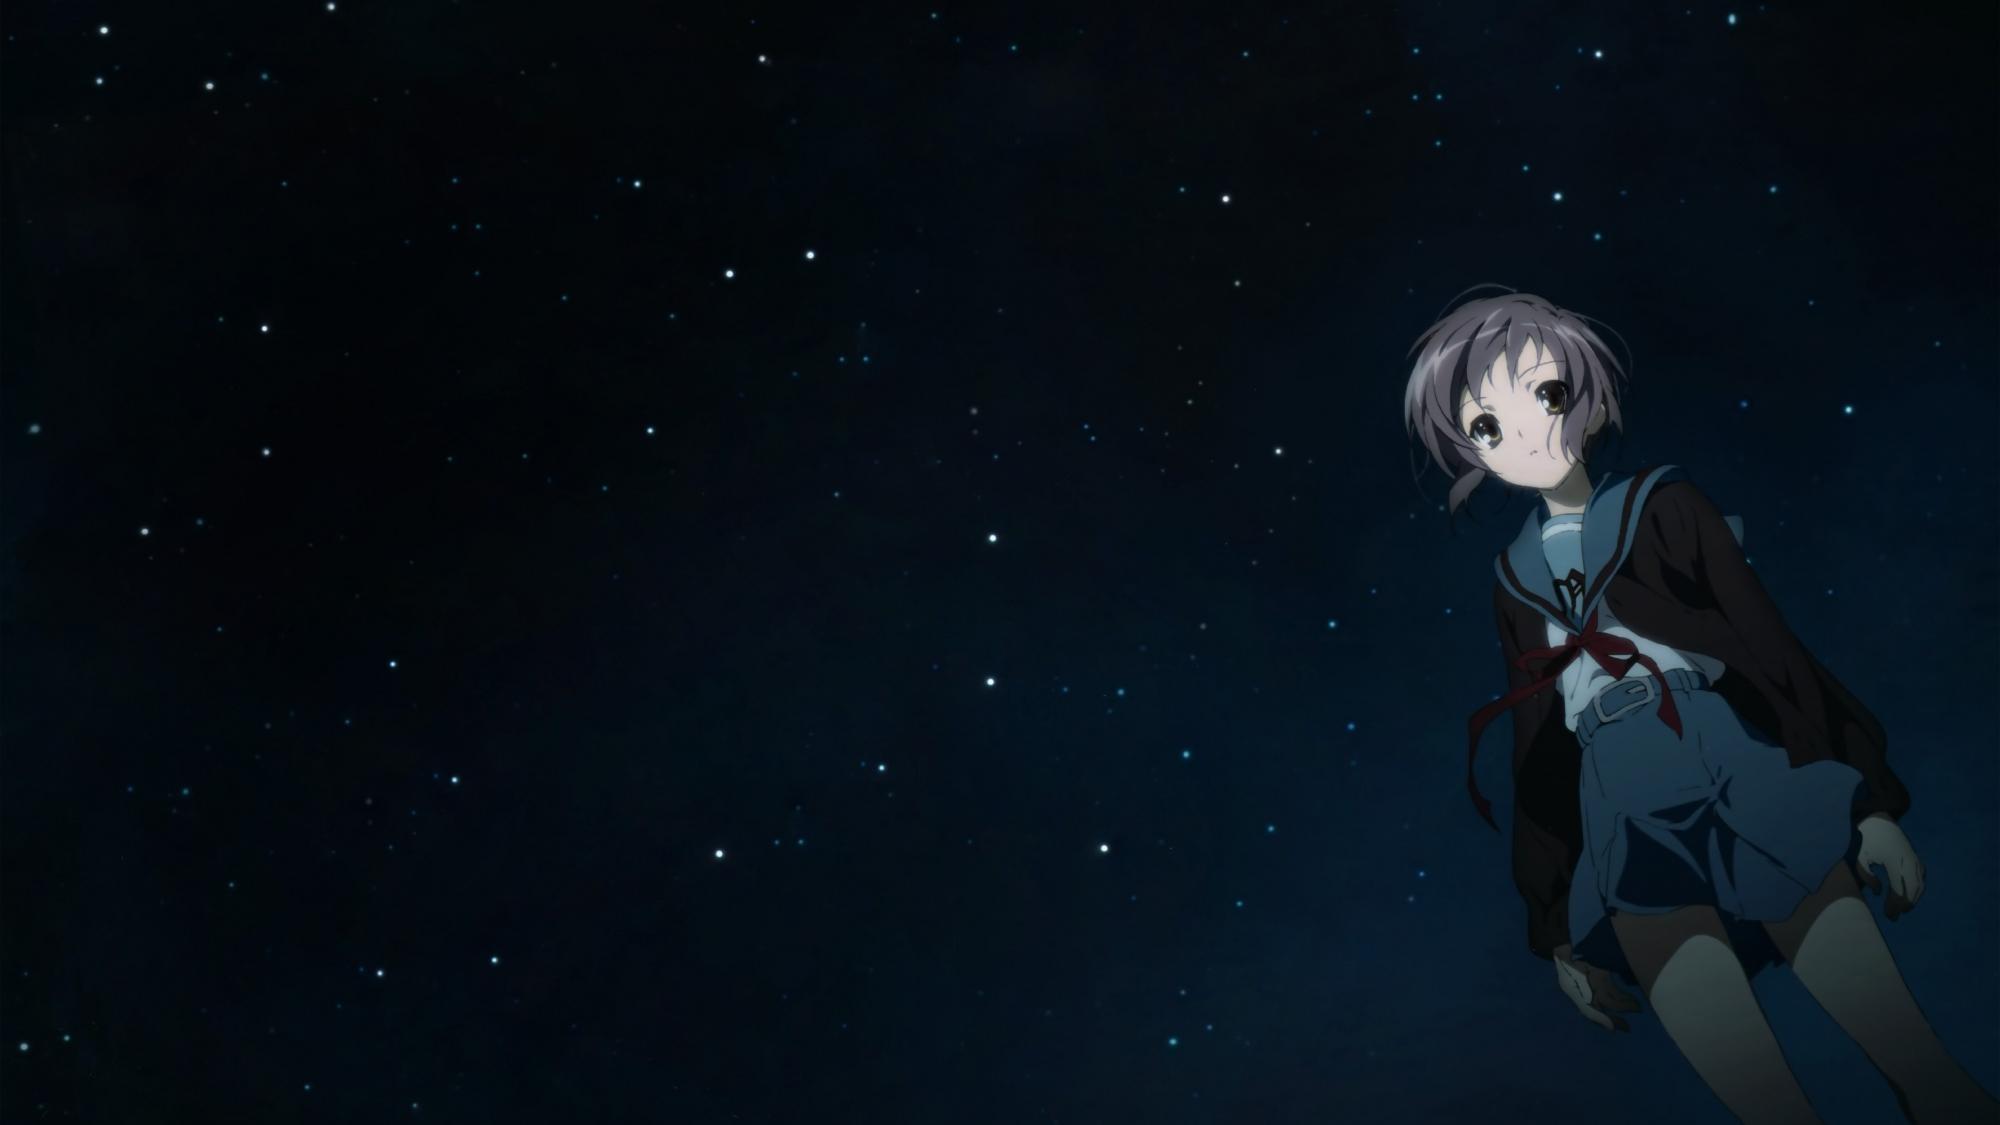 Download Yuki Nagato Wallpaper Hd Backgrounds Download Itl Cat